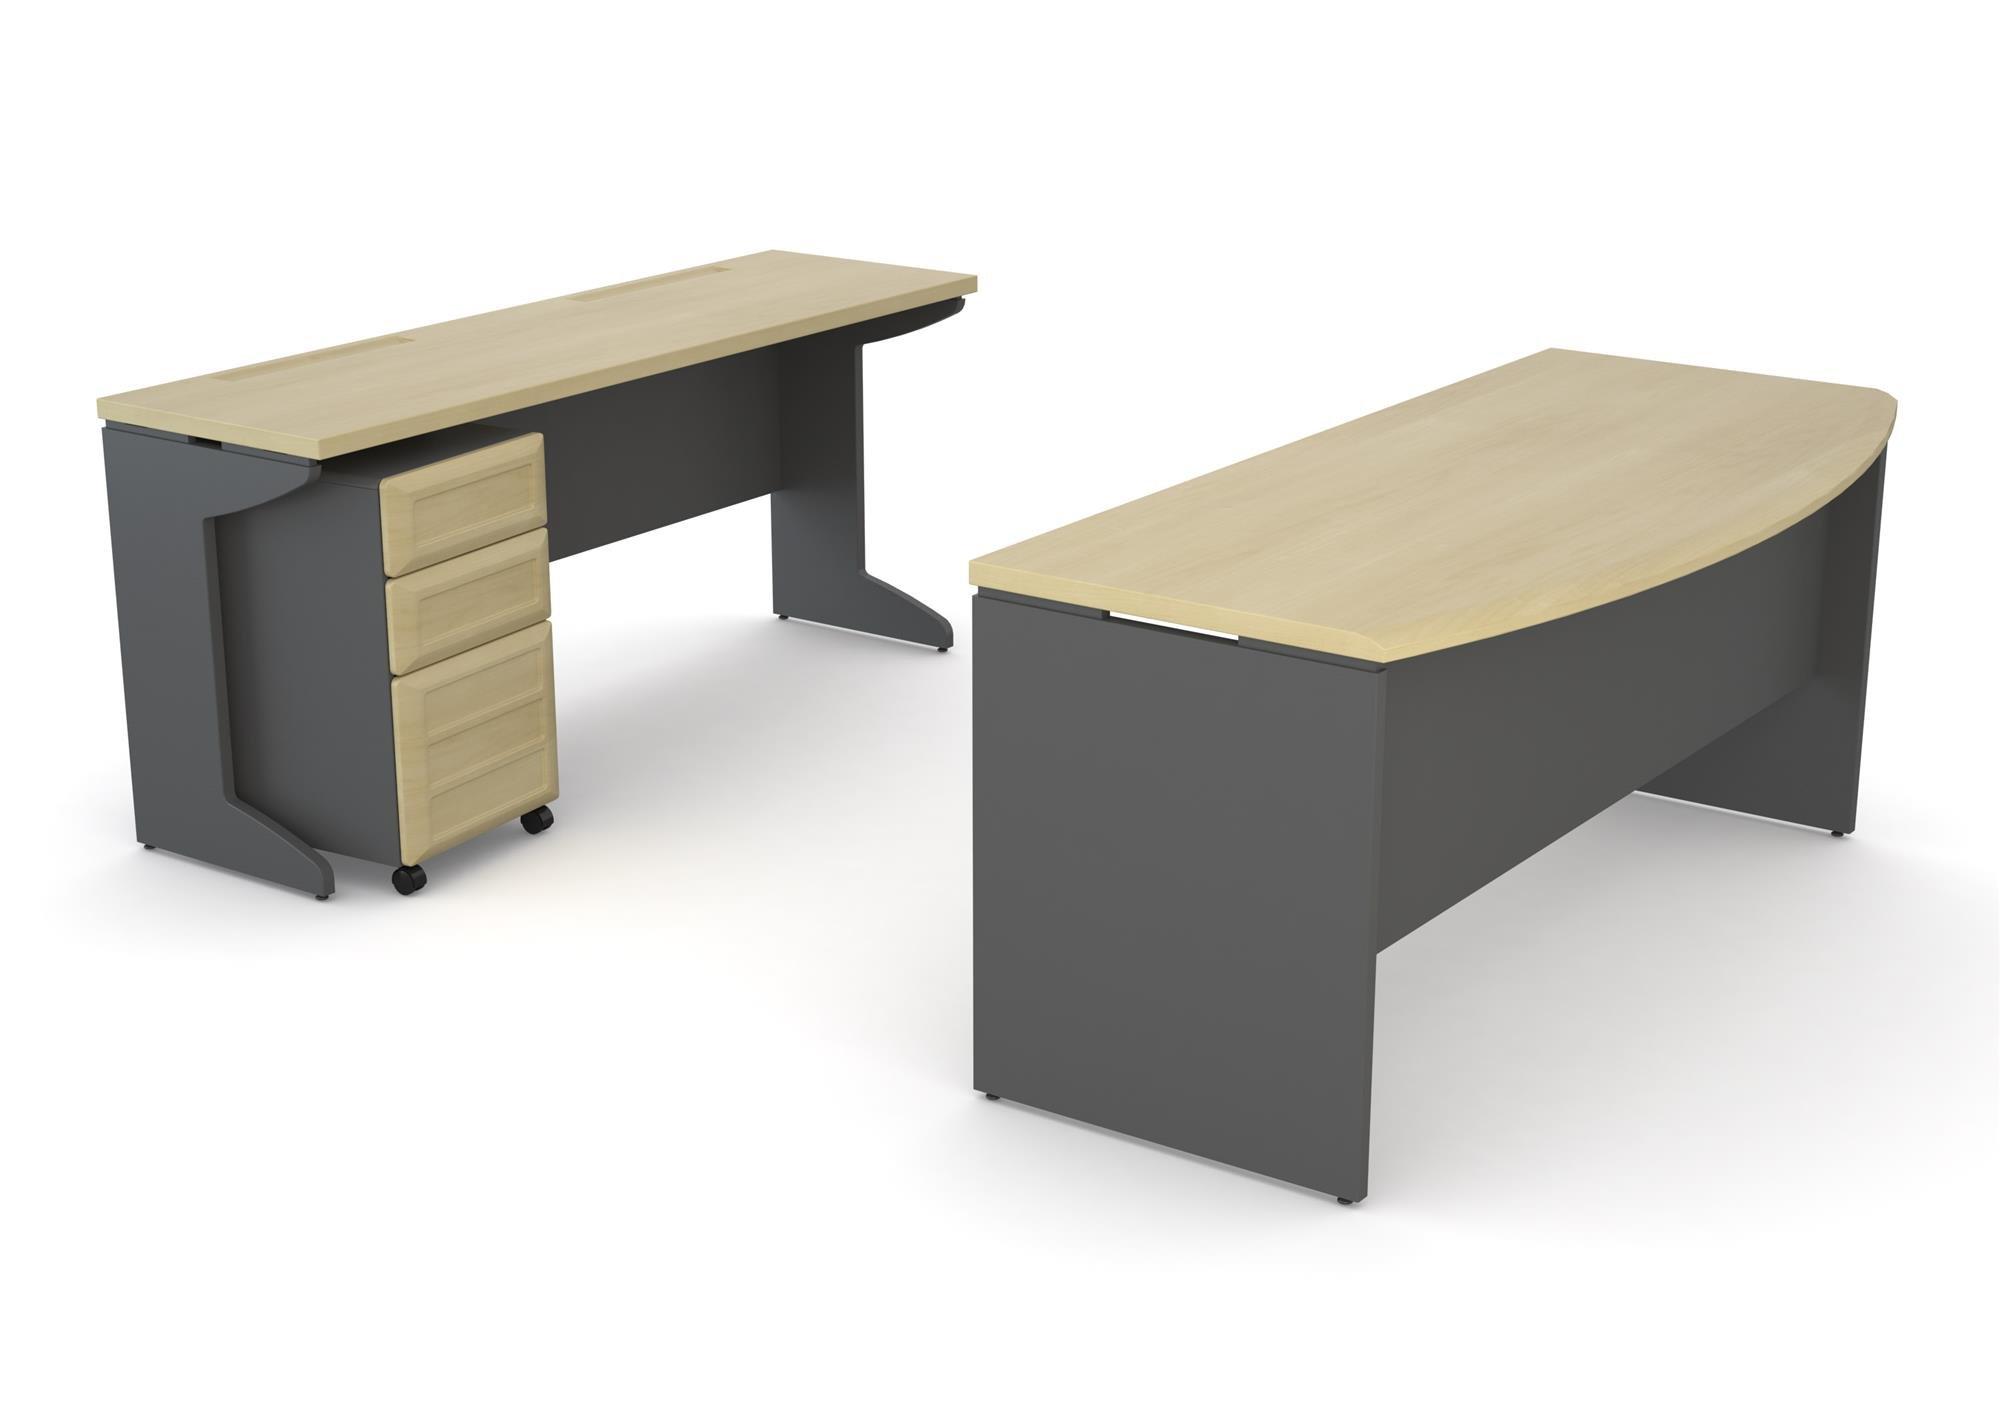 Altra Pursuit Office Set with Mobile File Cabinet Bundle, Natural/Gray